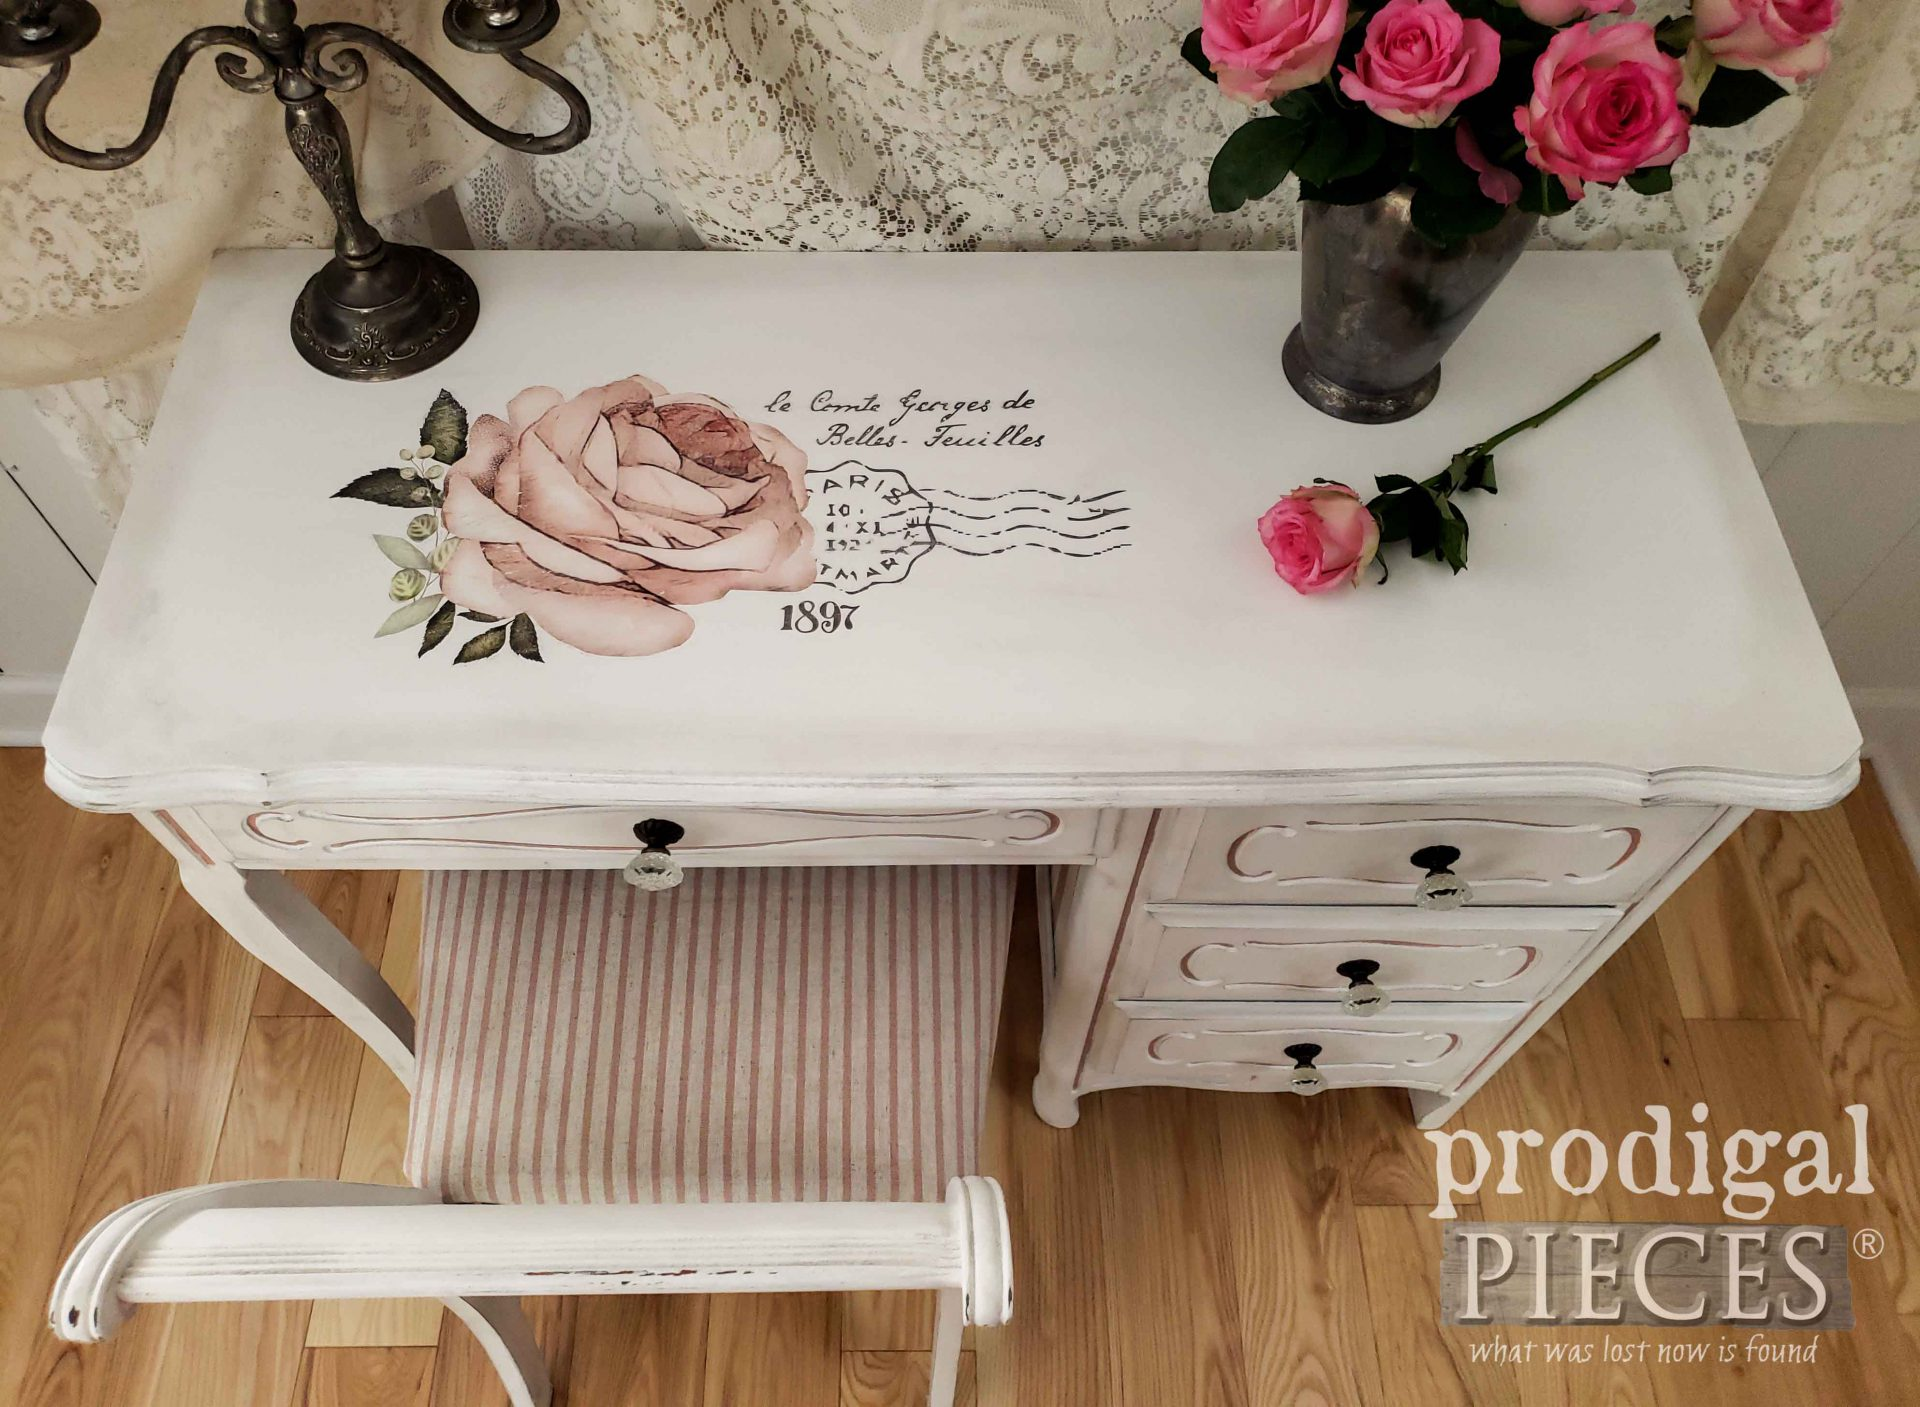 Vintage Shabby Chic Desk Makeover by Larissa of Prodigal Pieces | prodigalpieces.com #prodigalpieces #diy #home #furniture #homedecor